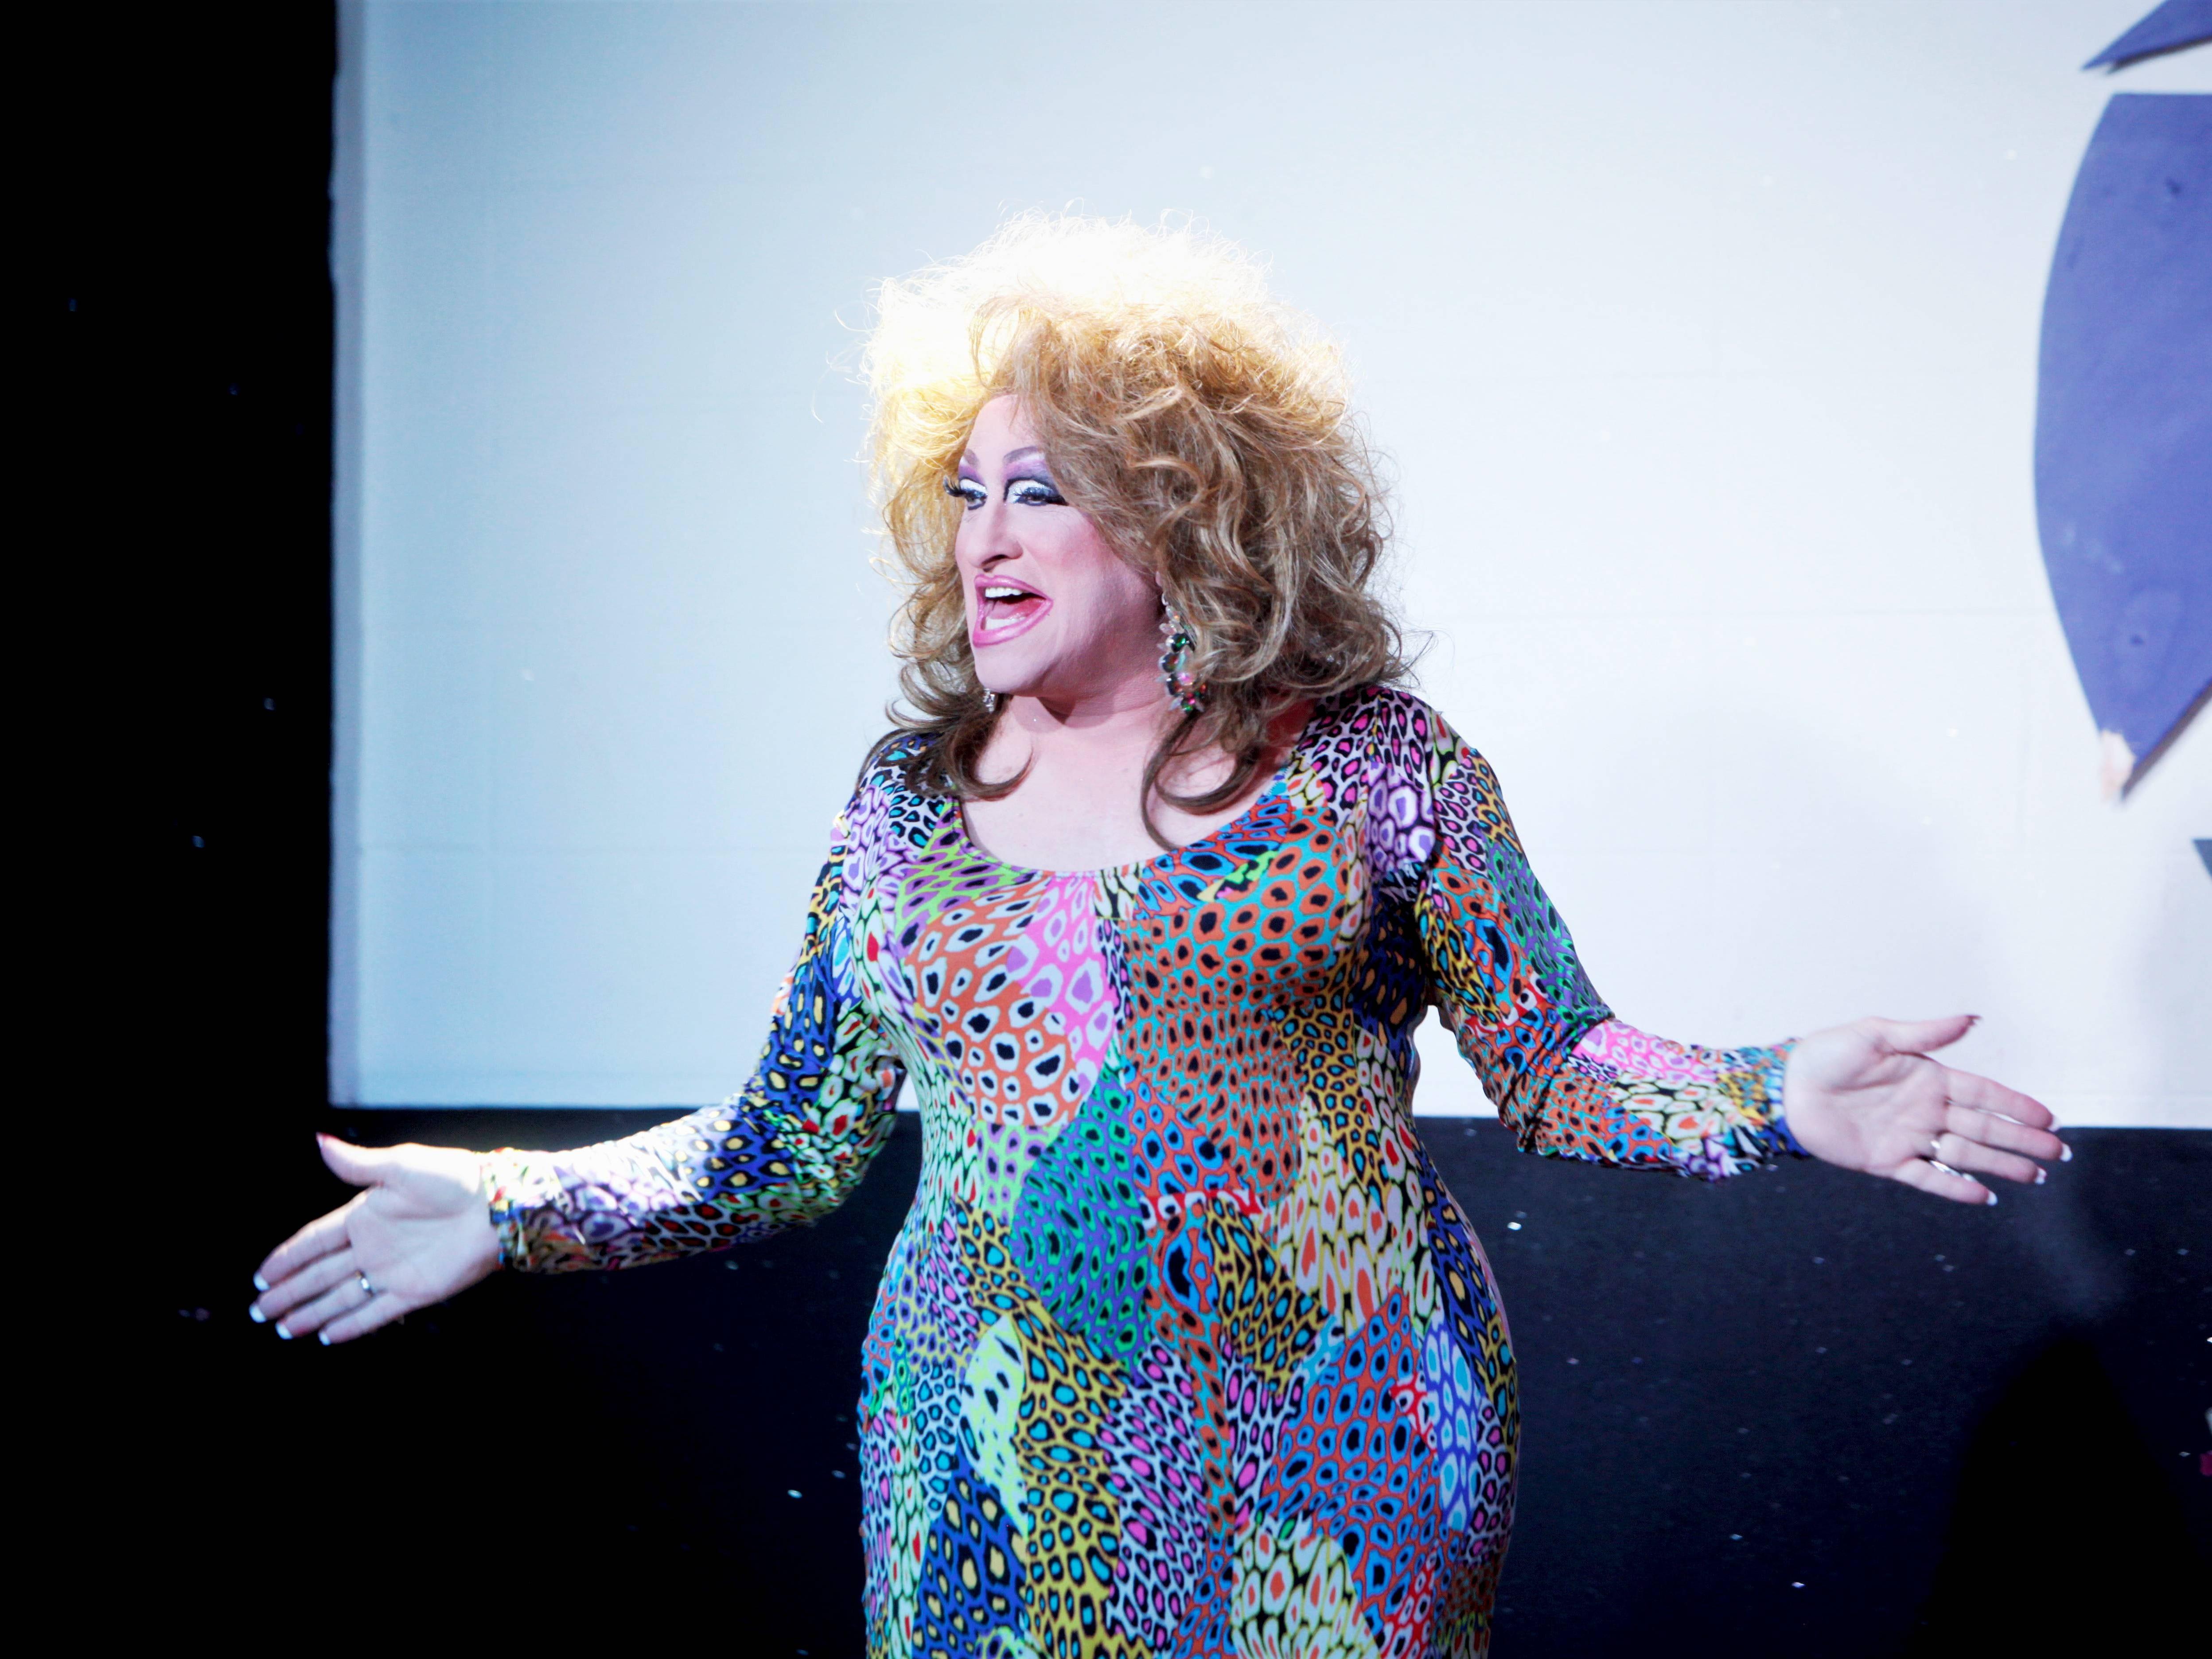 Ruby Diamond hosts Drag Queen Charity Bingo Feb. 10 at Fuzion.